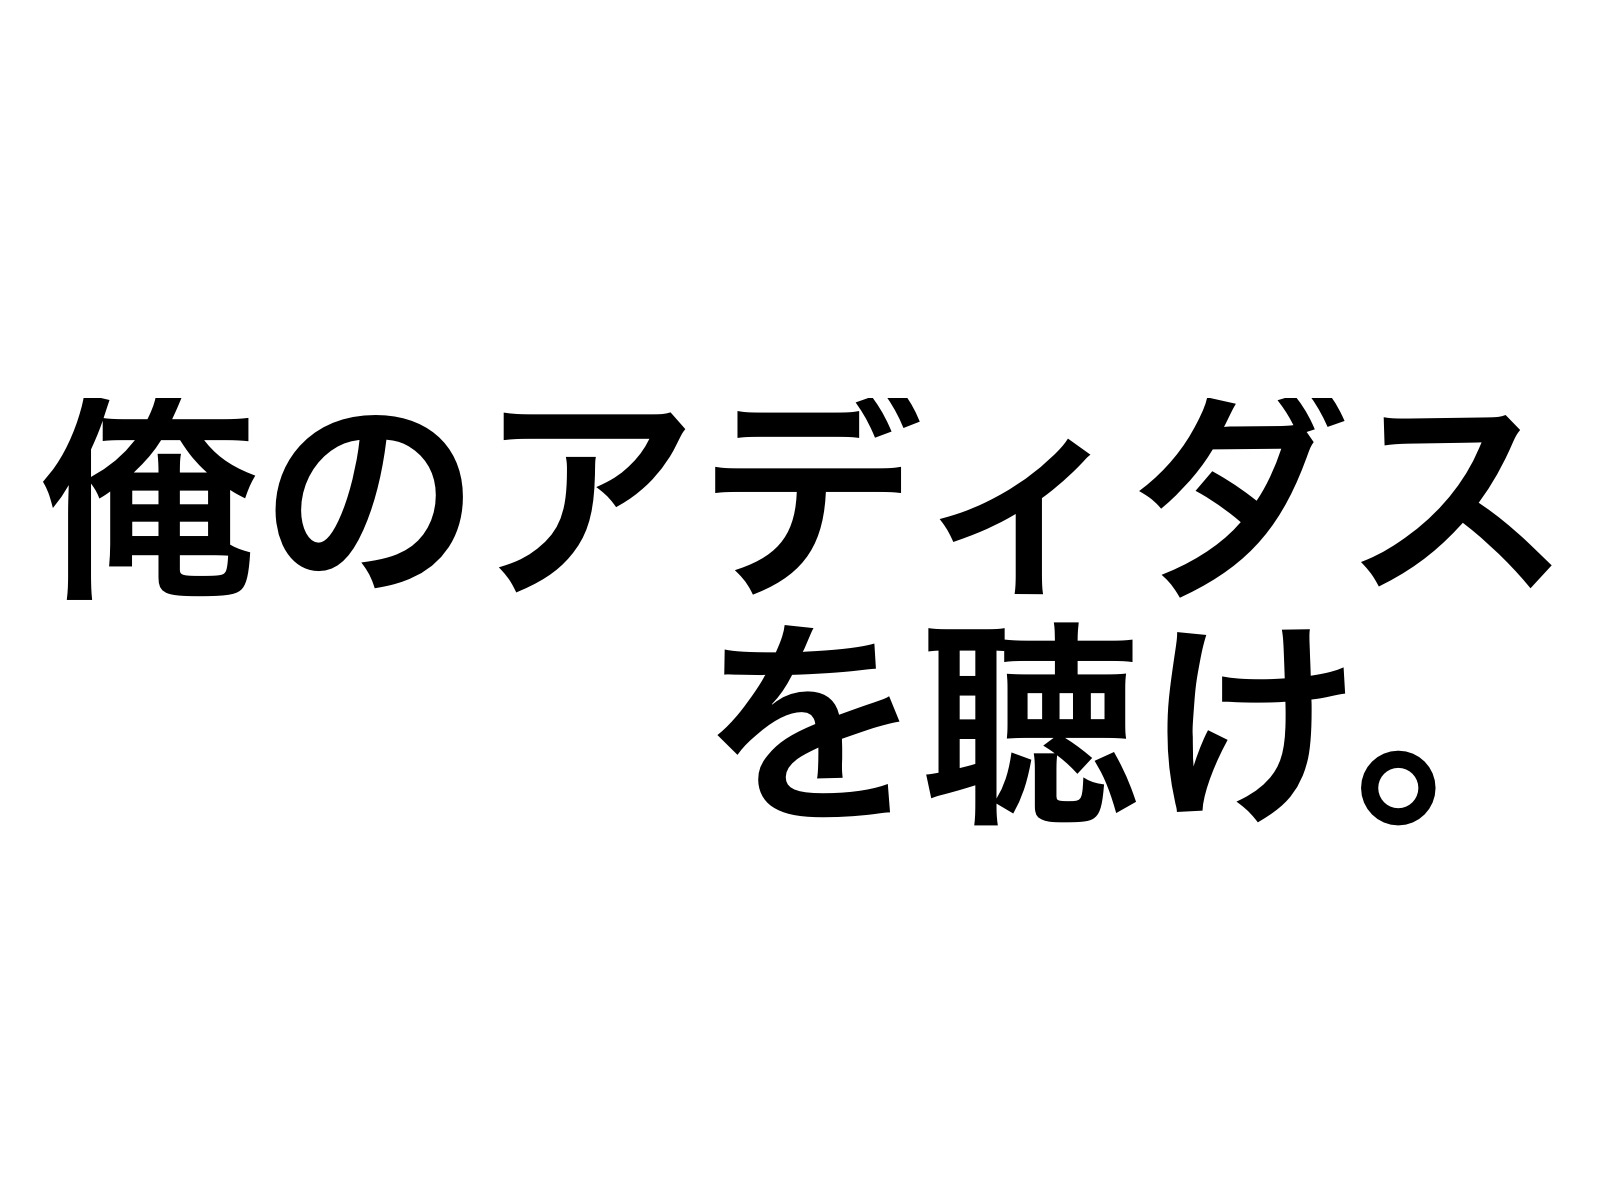 2017 01 31 20 37 4